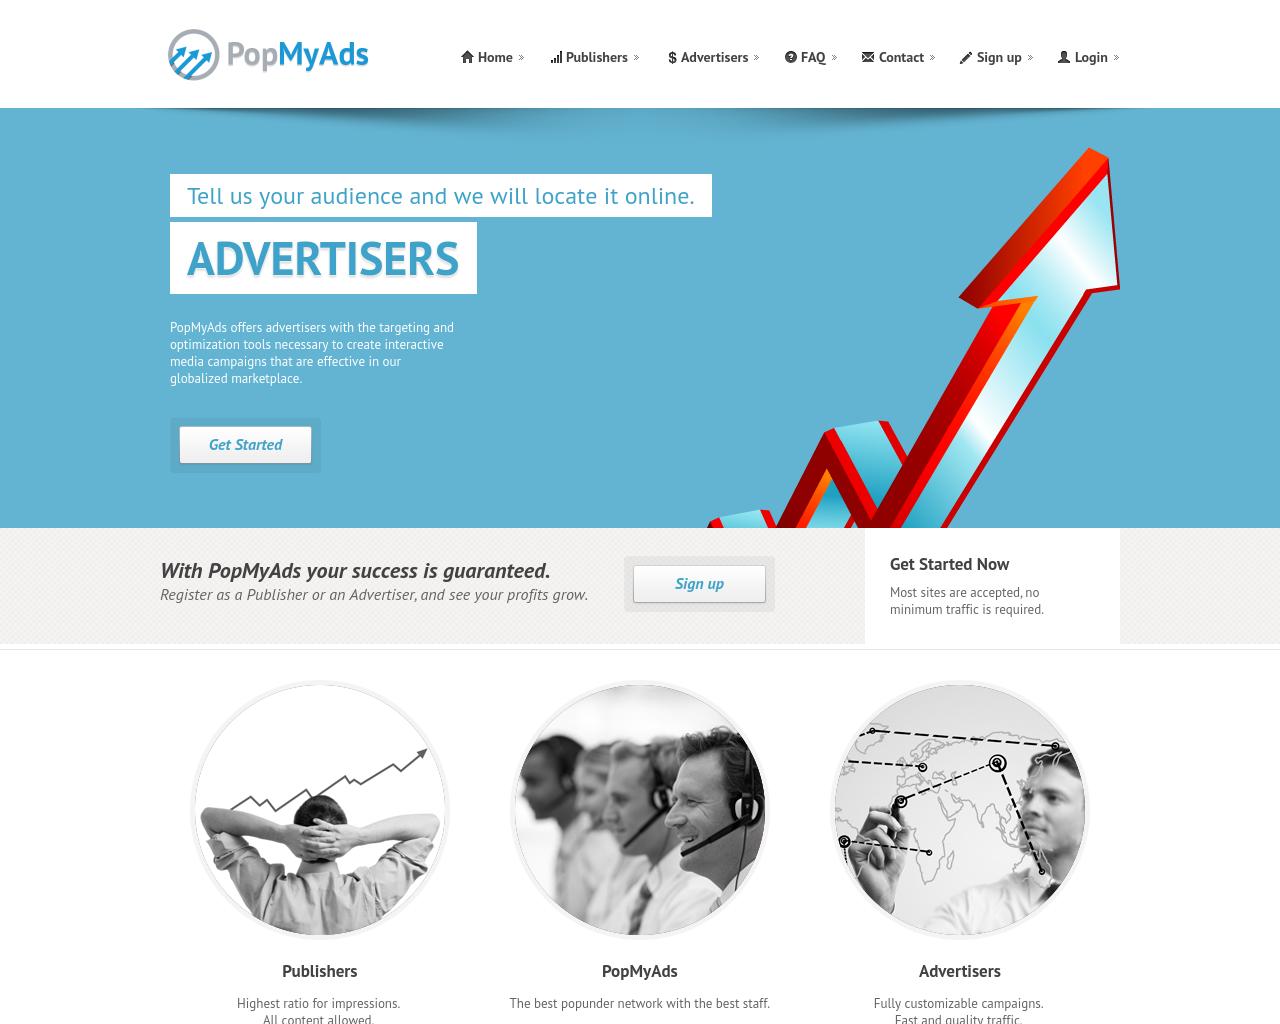 PopMyAds-Advertising-Reviews-Pricing